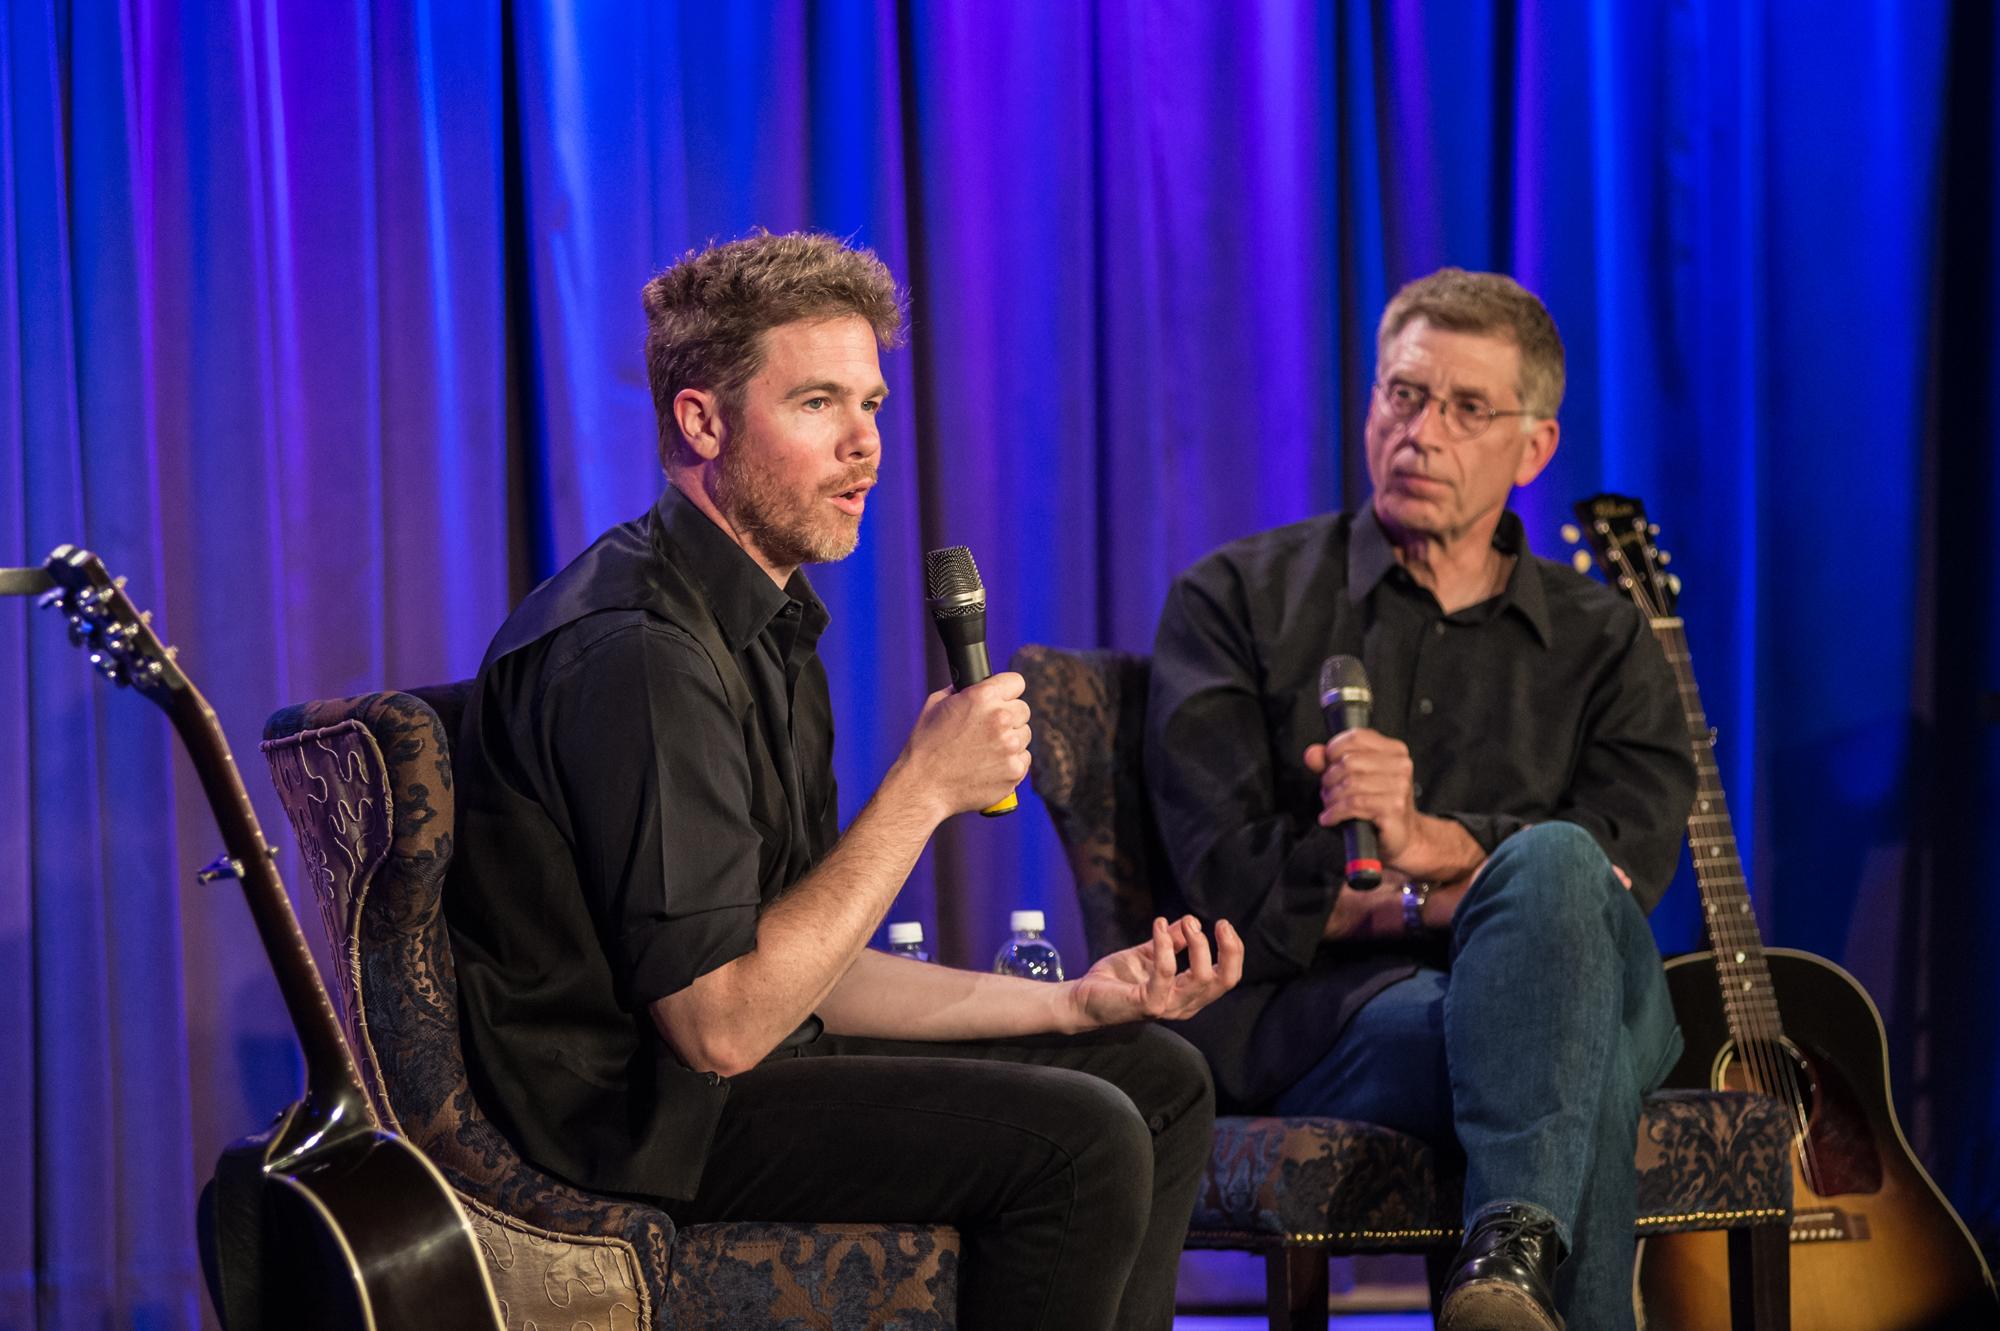 Josh Ritter, Grammy Museum